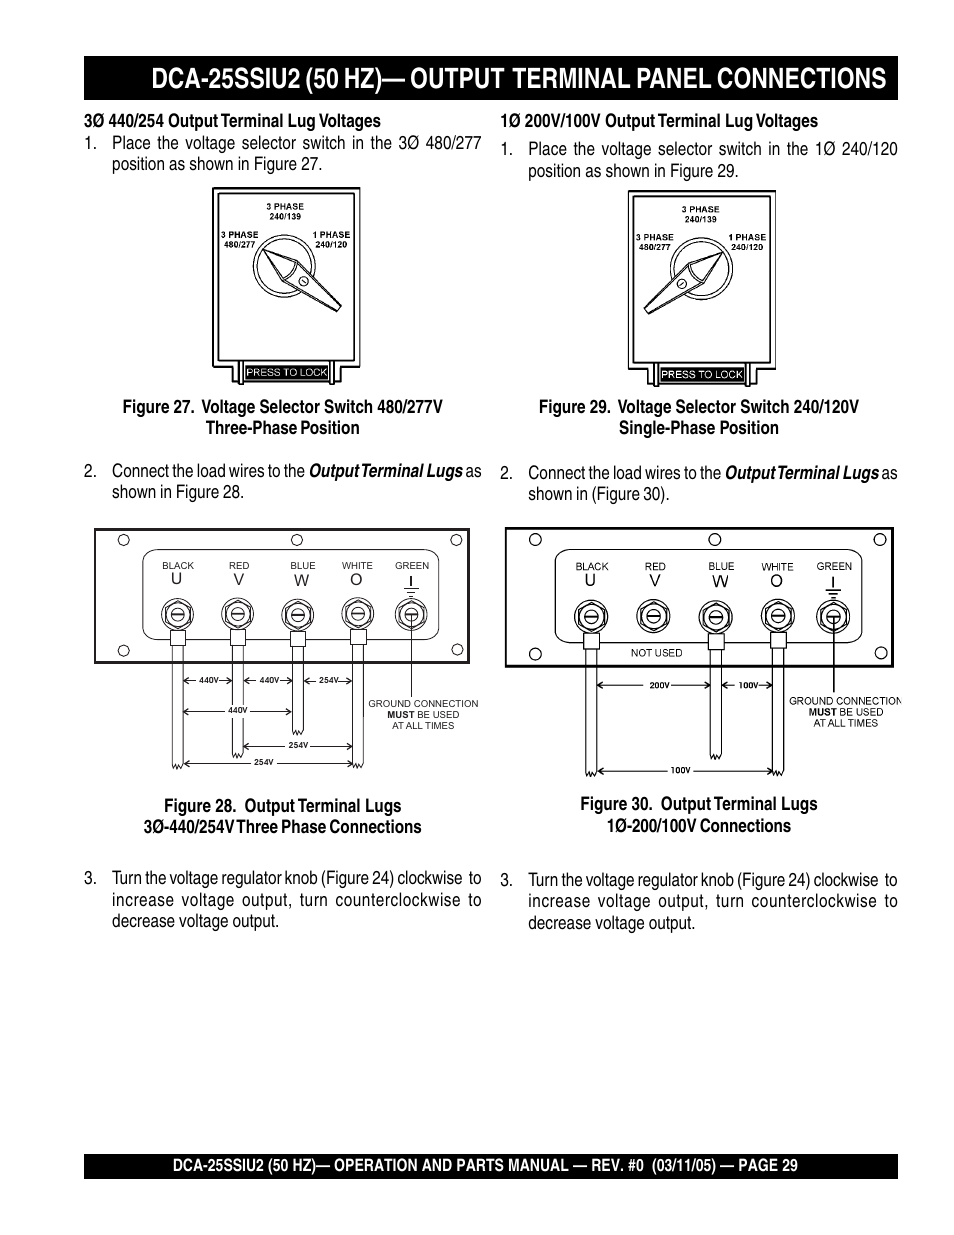 hight resolution of multiquip mq power whisperwatt 50 hz generator dca 25ssiu2 user manual page 29